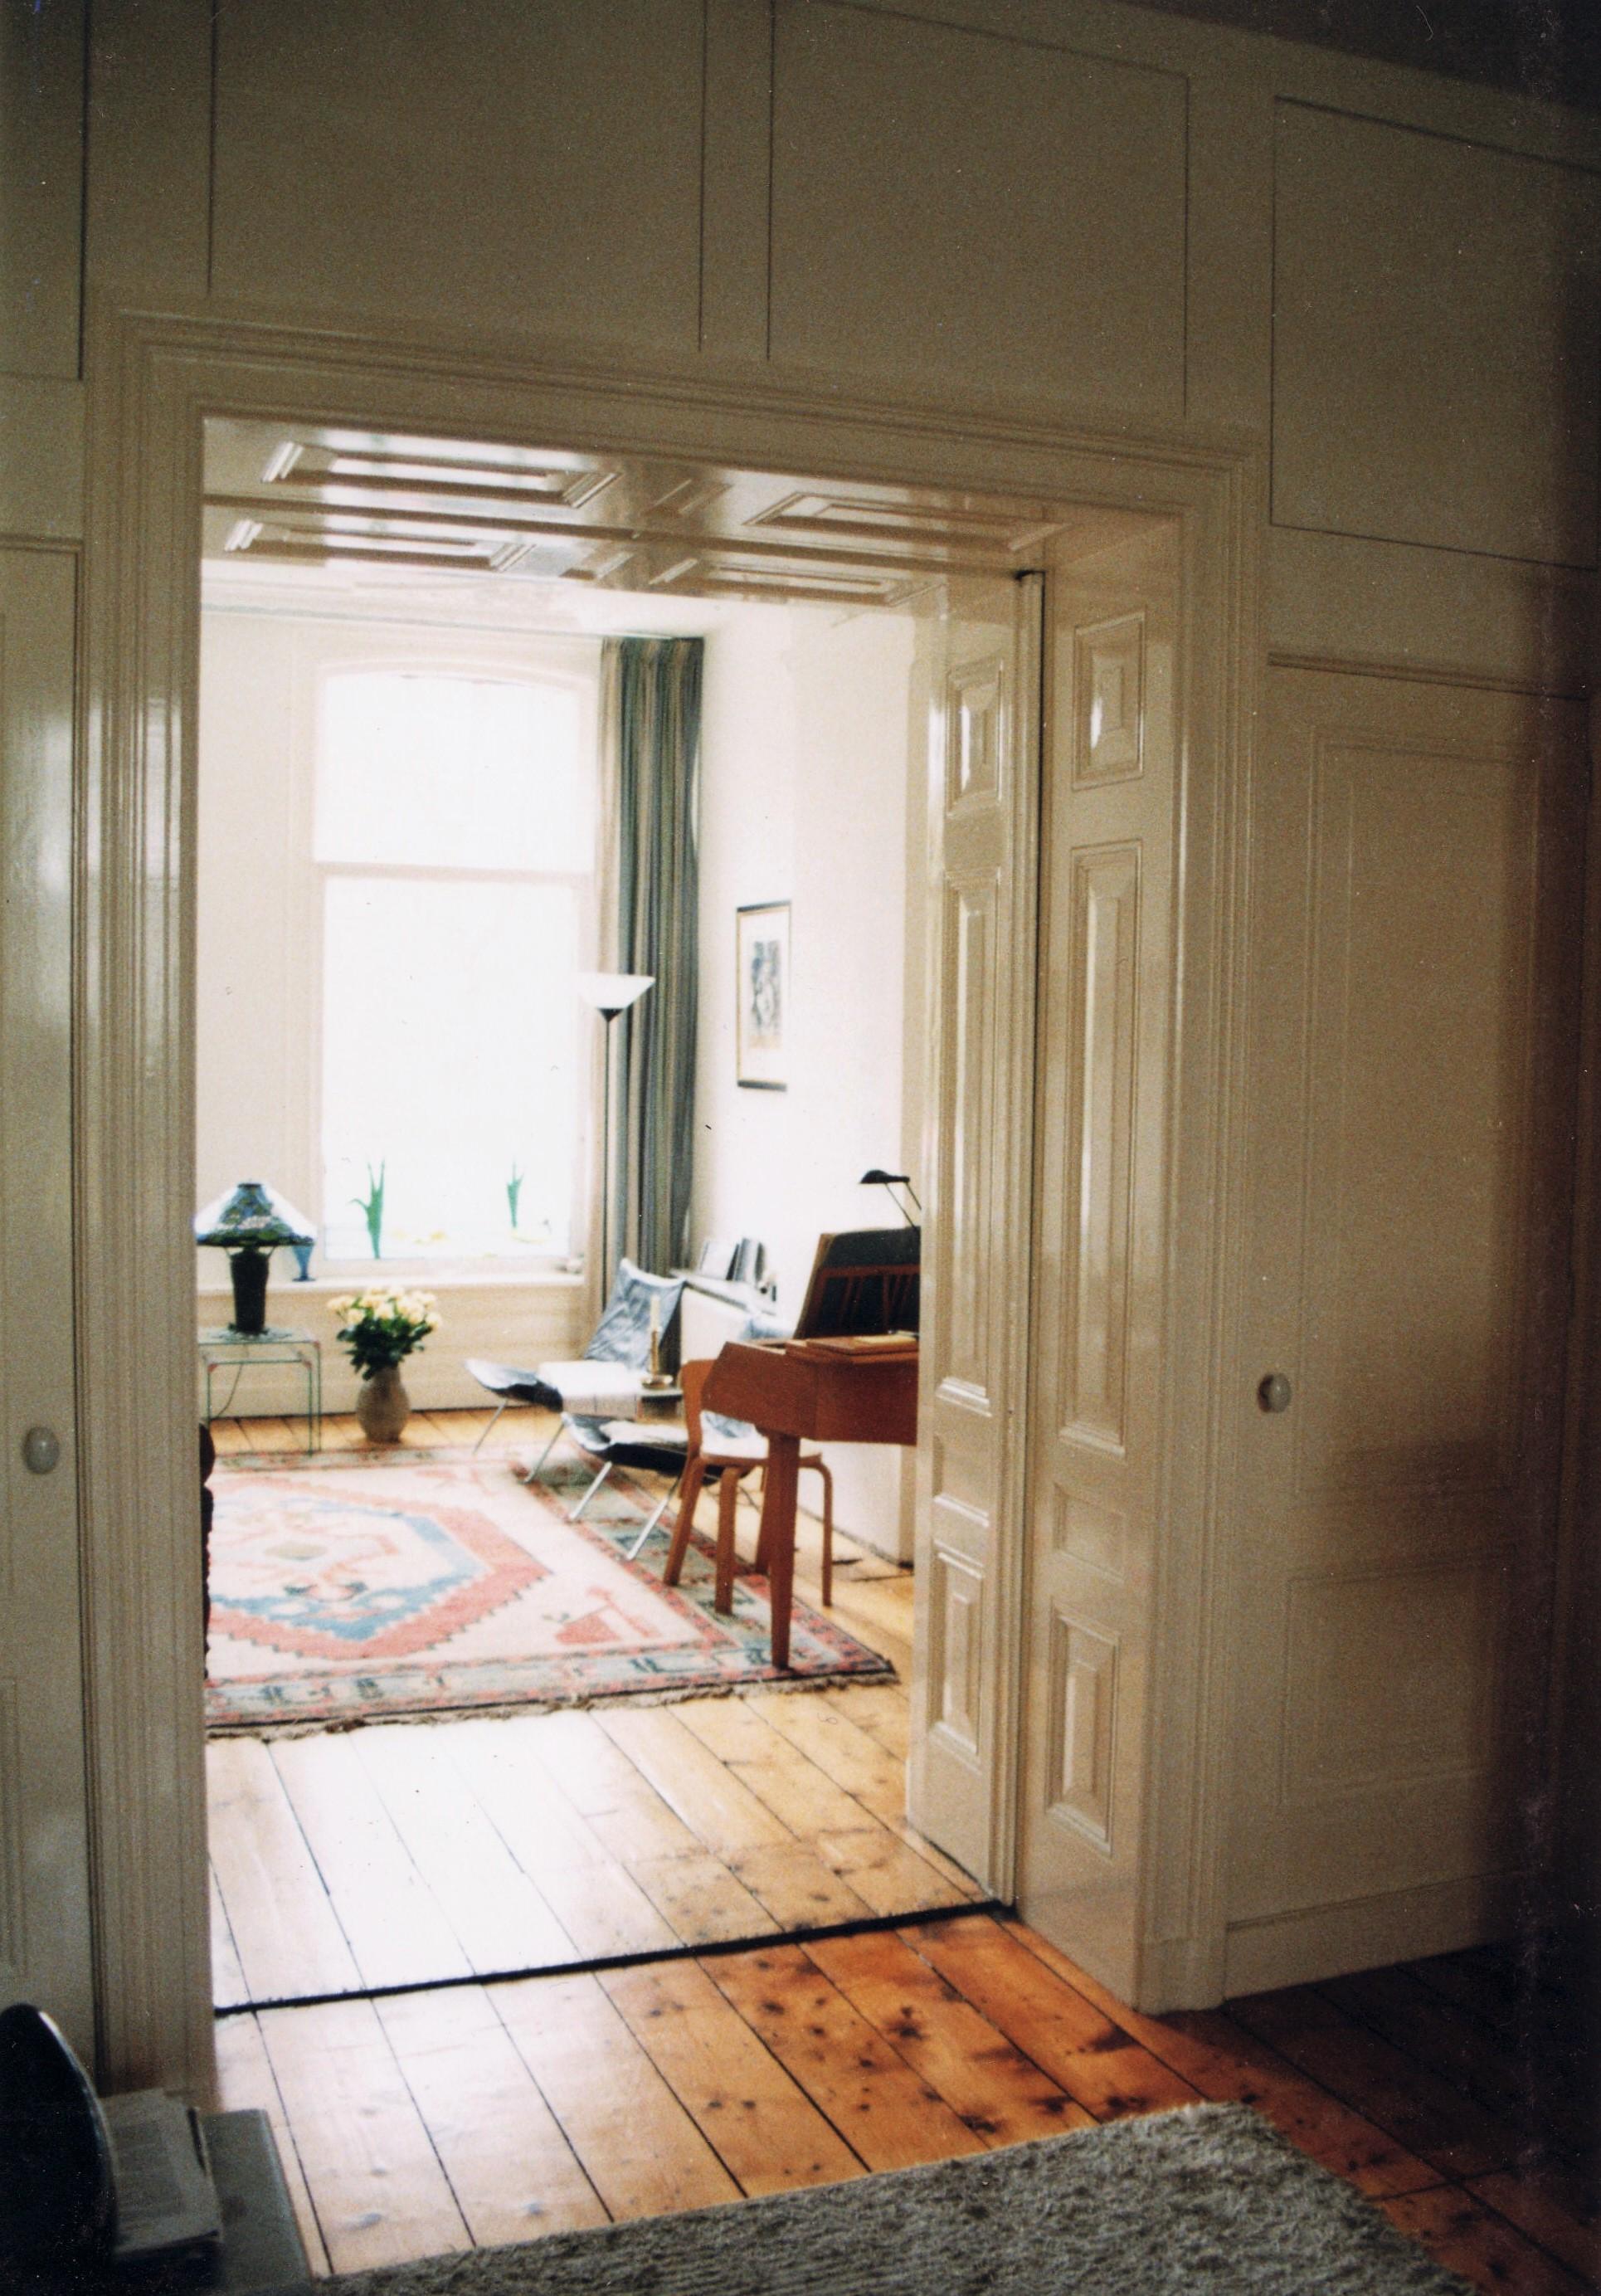 Uitbreiding kamer en suite kasten